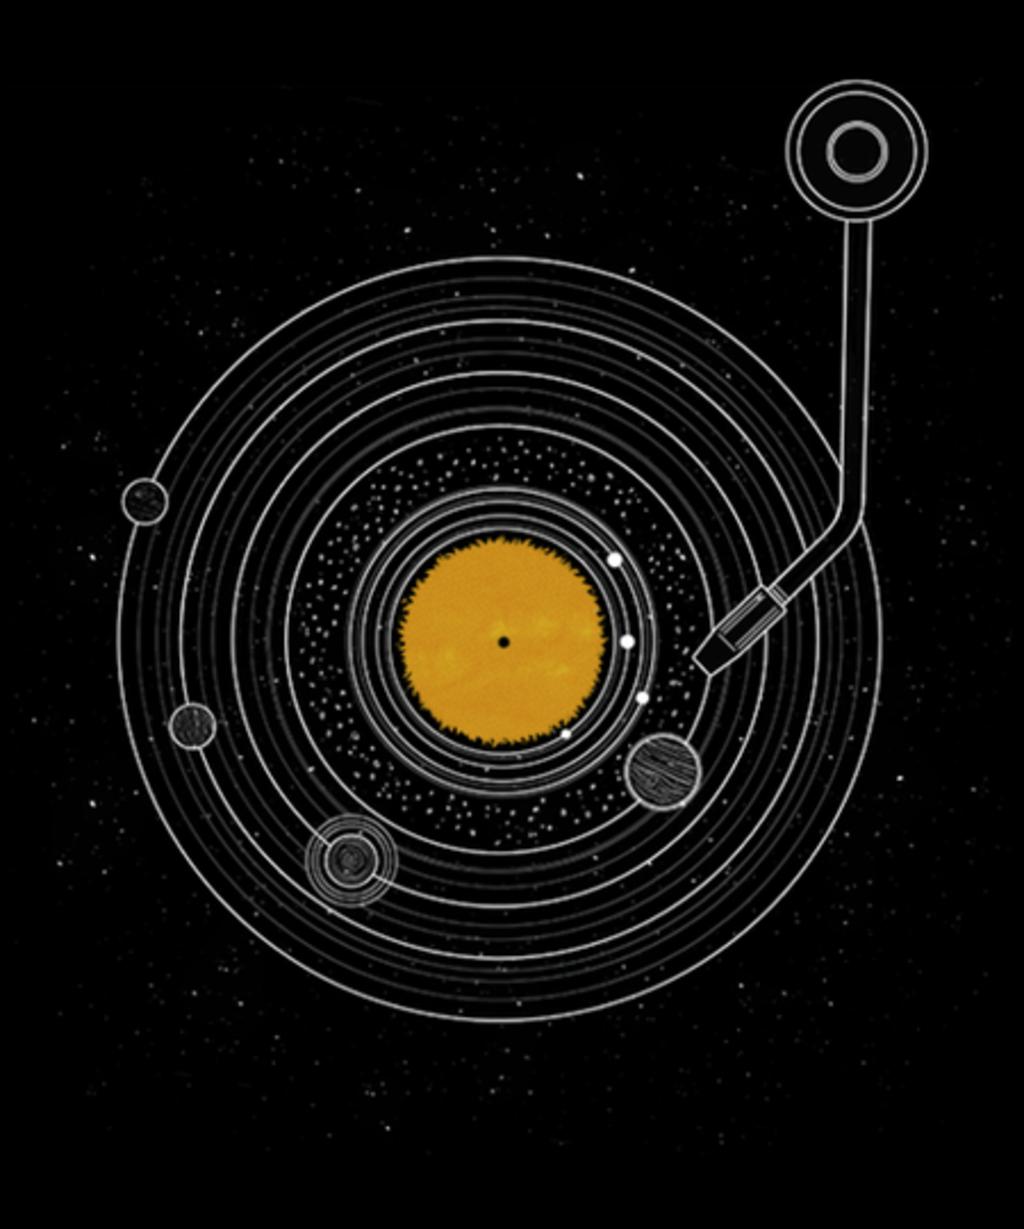 Qwertee: Cosmic Symphony